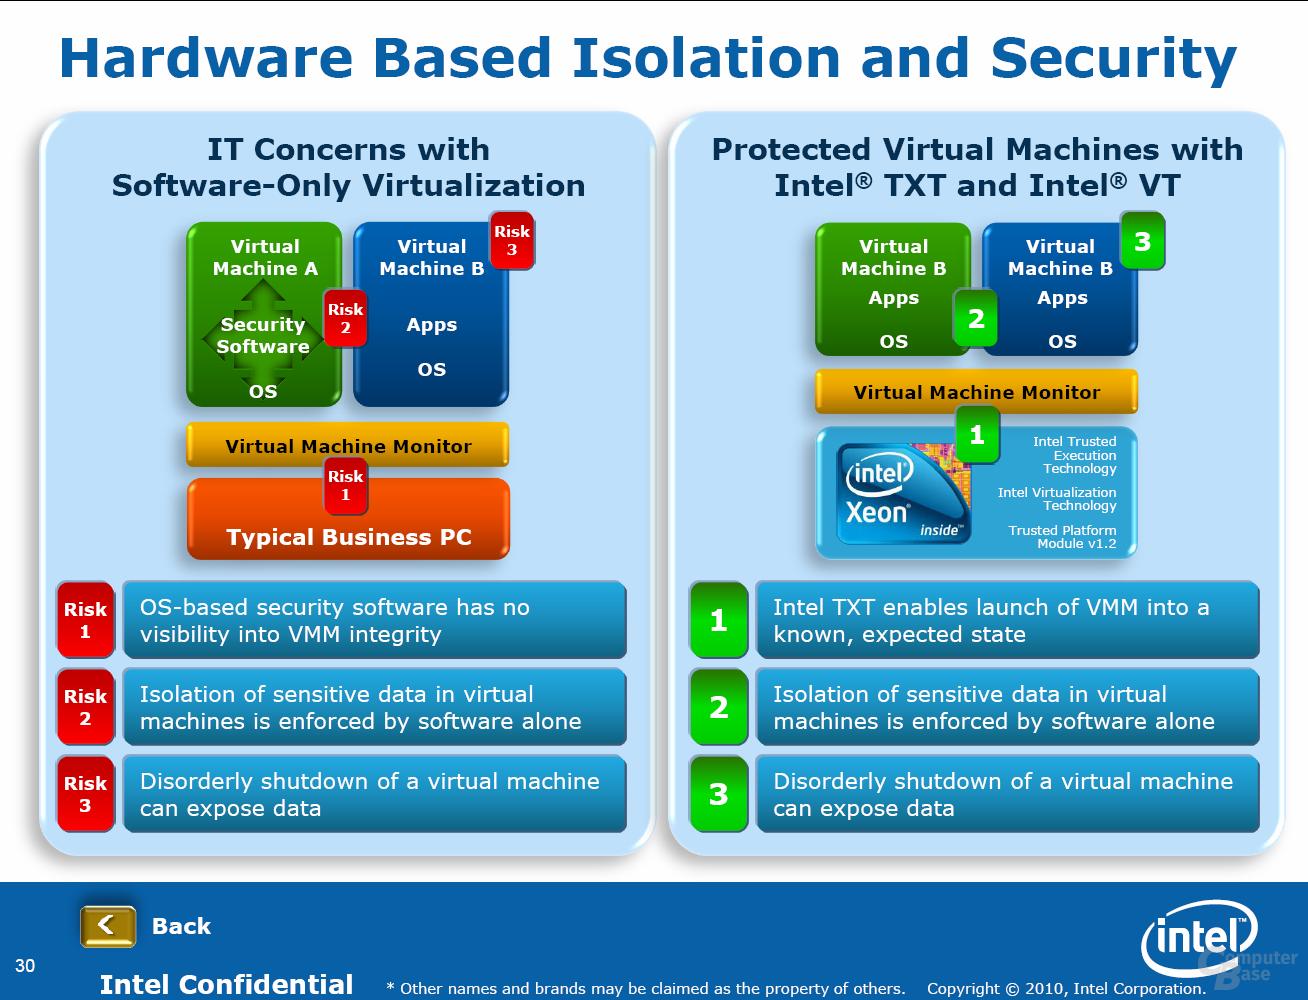 Intel TXT